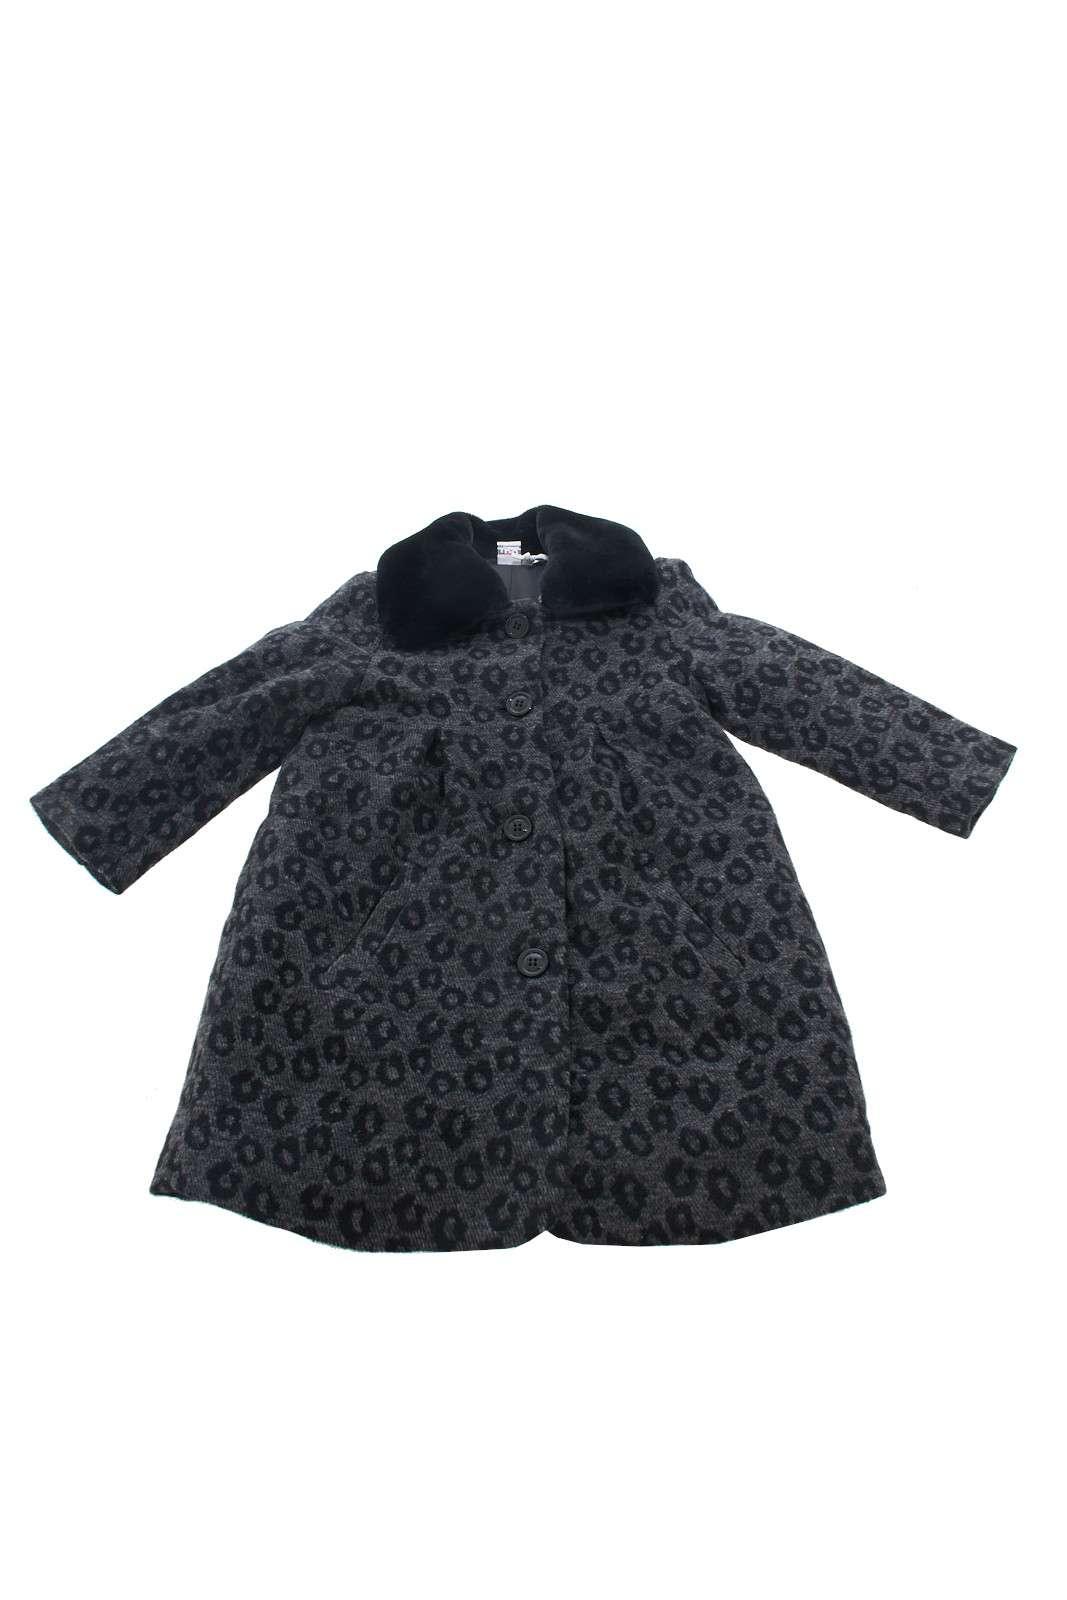 https://www.parmax.com/media/catalog/product/a/i/AI-outlet_parmax-cappotto-bambina-Ido-4T985-A.jpg